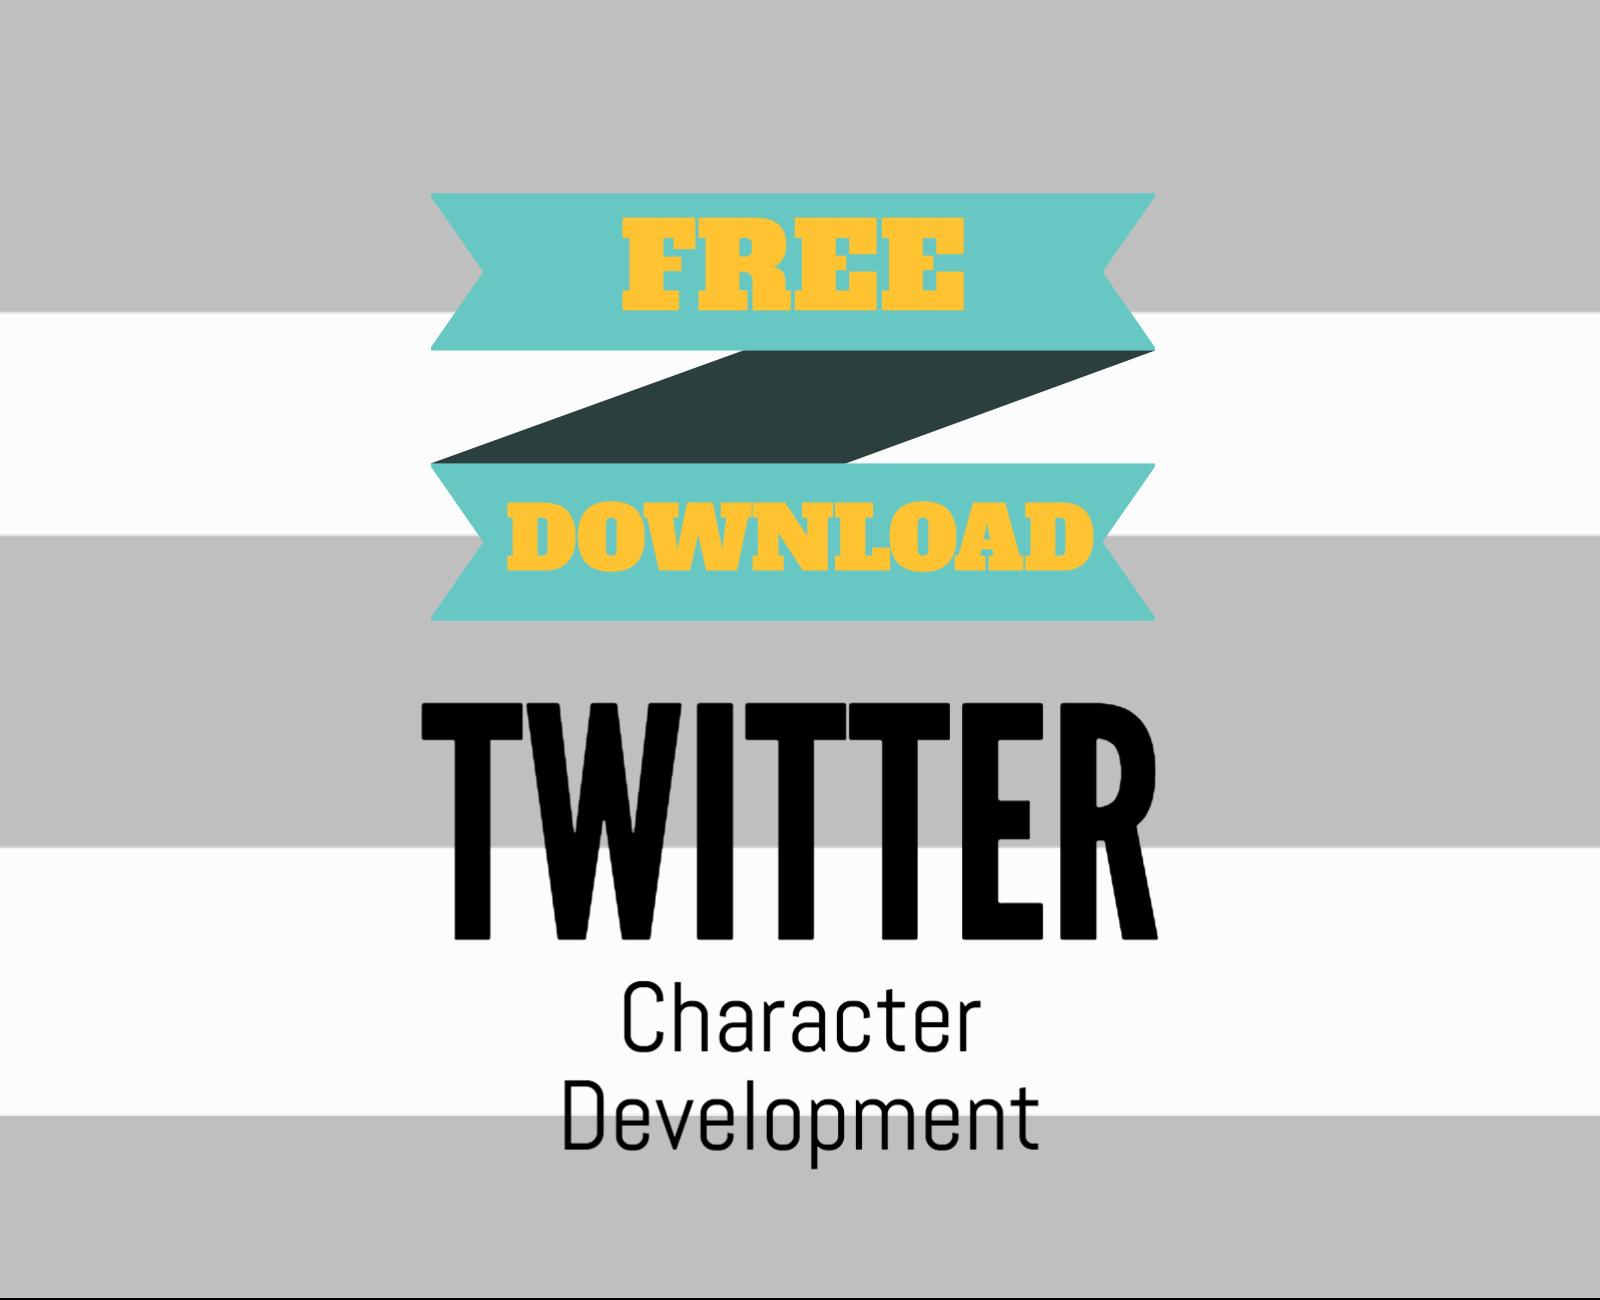 Free Download Twitter Character Development Worksheet